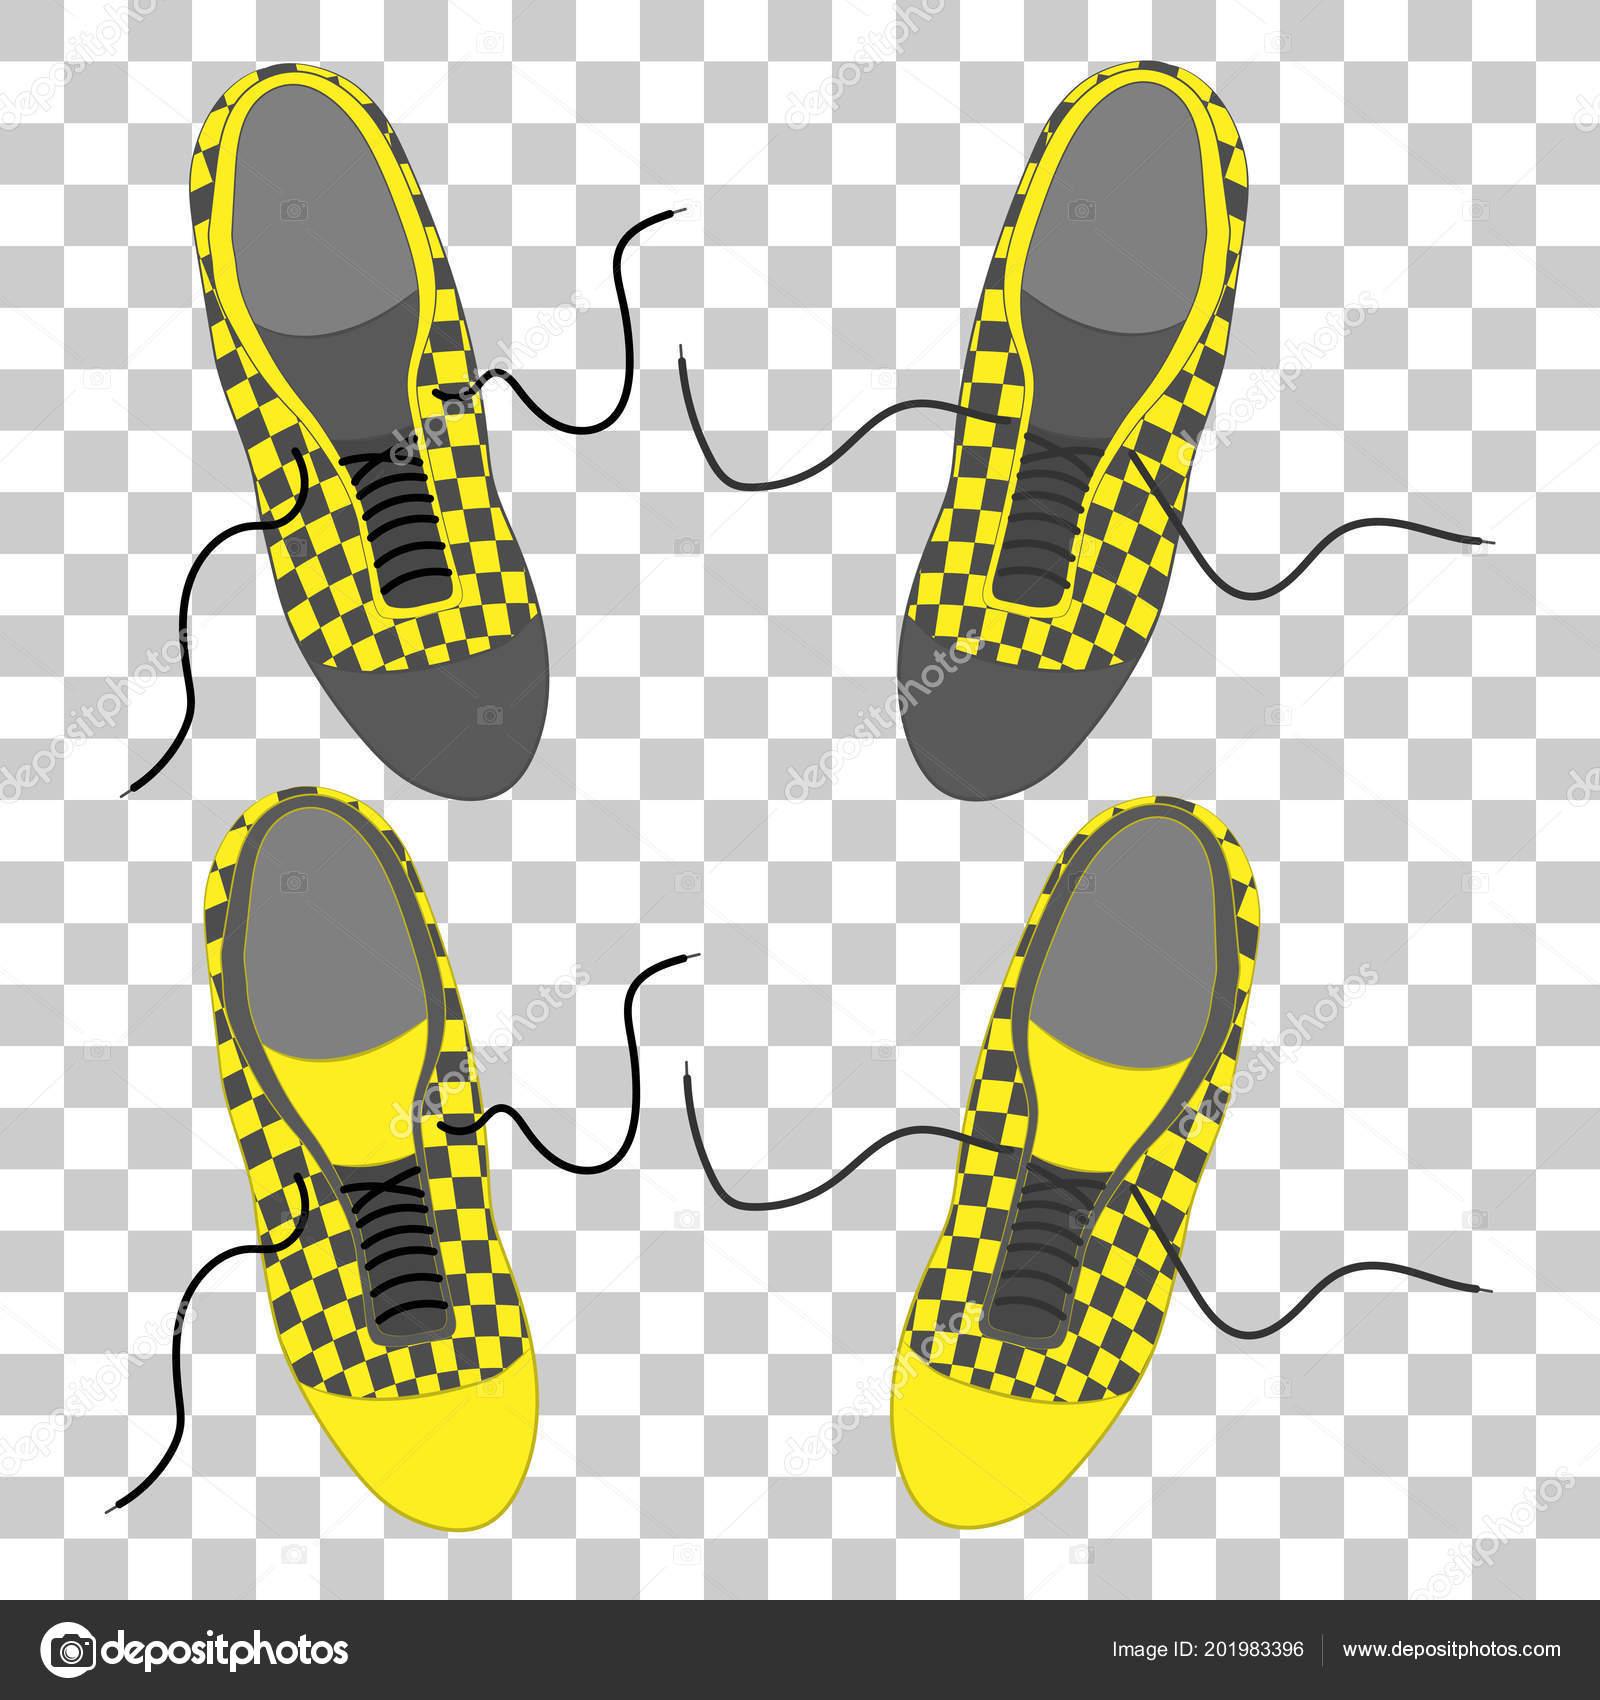 38e2d5ded29 Αθλητικά Παπούτσια Κορδόνια Χρώματα Κίτρινο Και Μαύρο Snickers ...